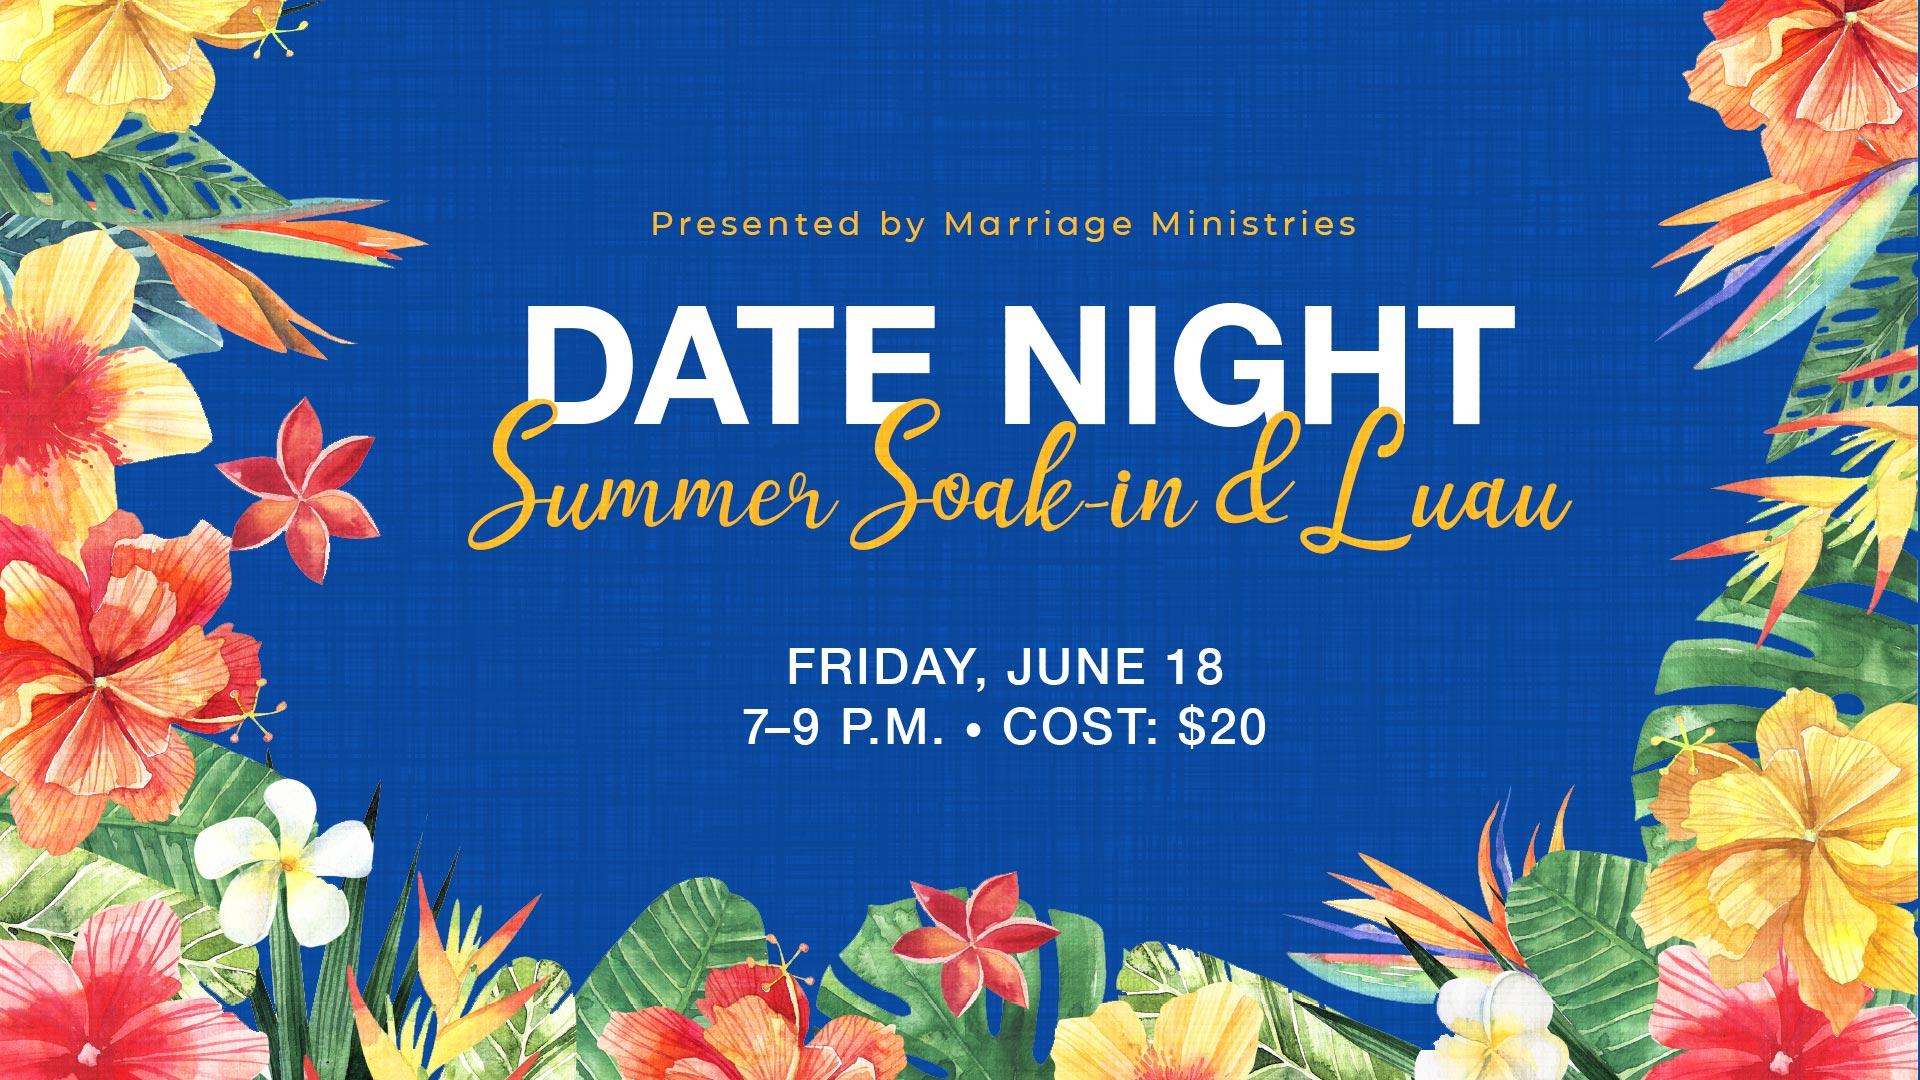 Date Night: Summer Soak In y Luau